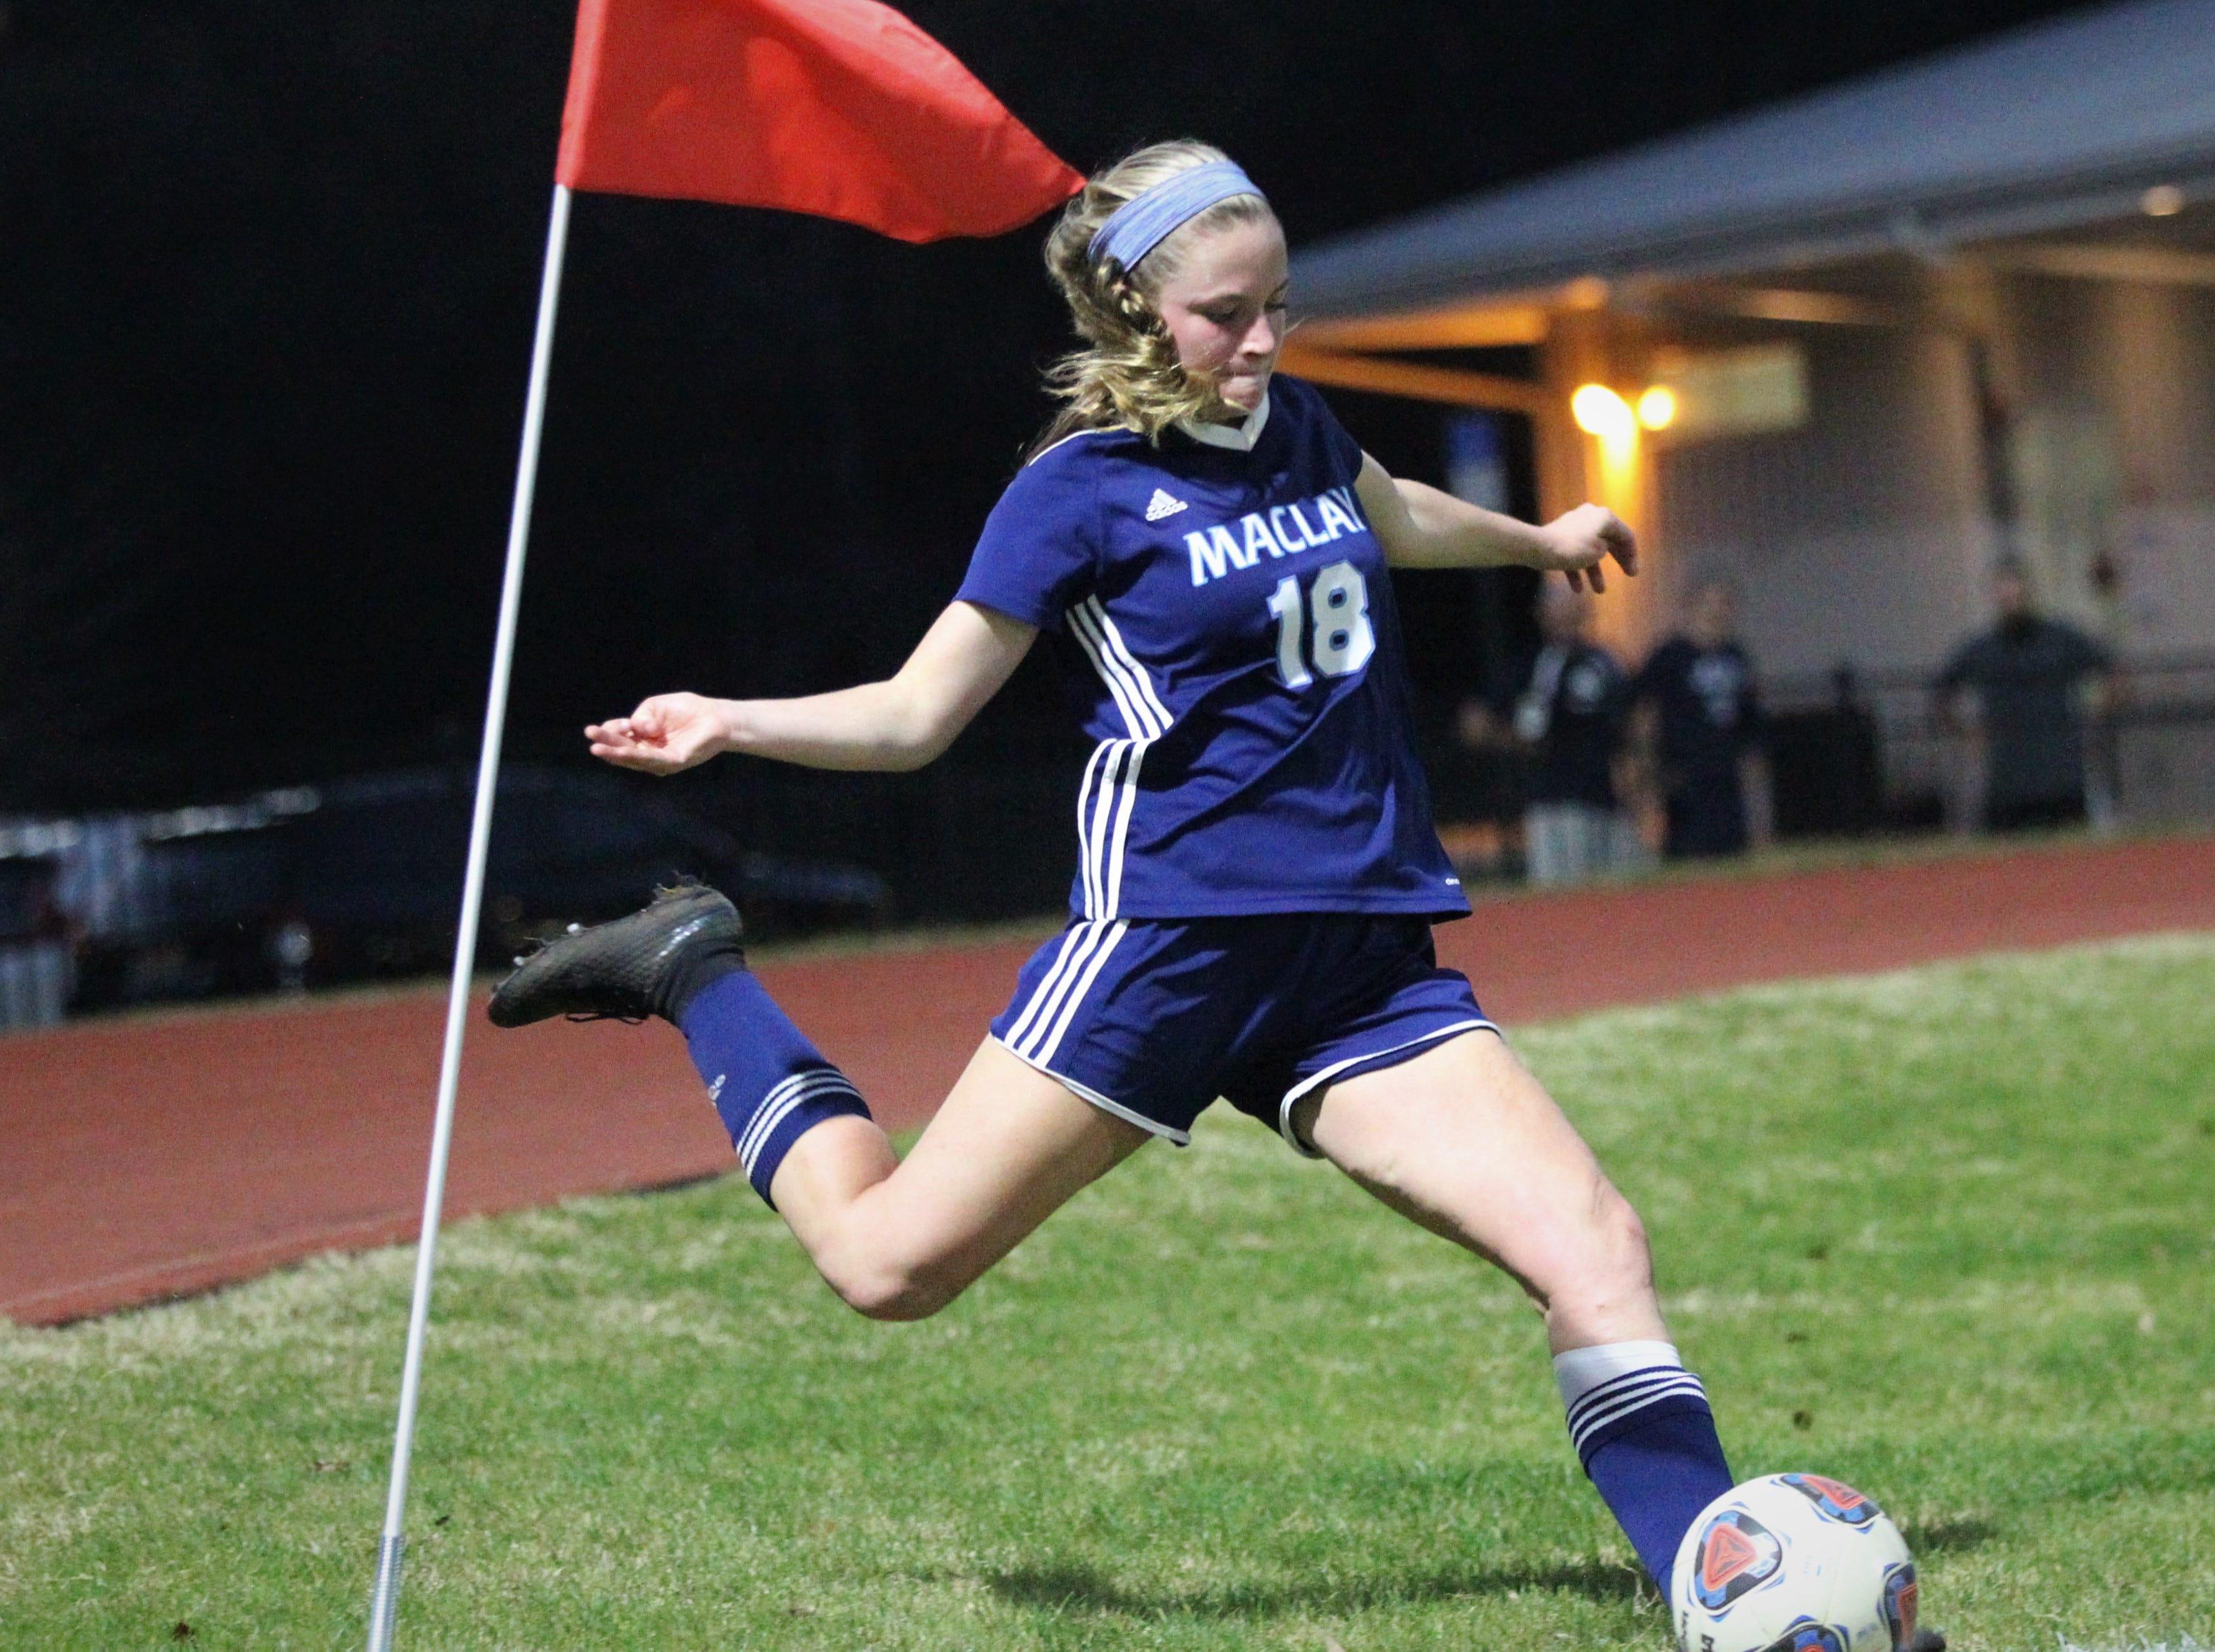 Maclay's  Avery Smith takes a corner kick as Maclay's girls soccer team beat St. Joseph Academy 4-0 in a Region 1-1A quarterfinal on Jan. 5, 2019.